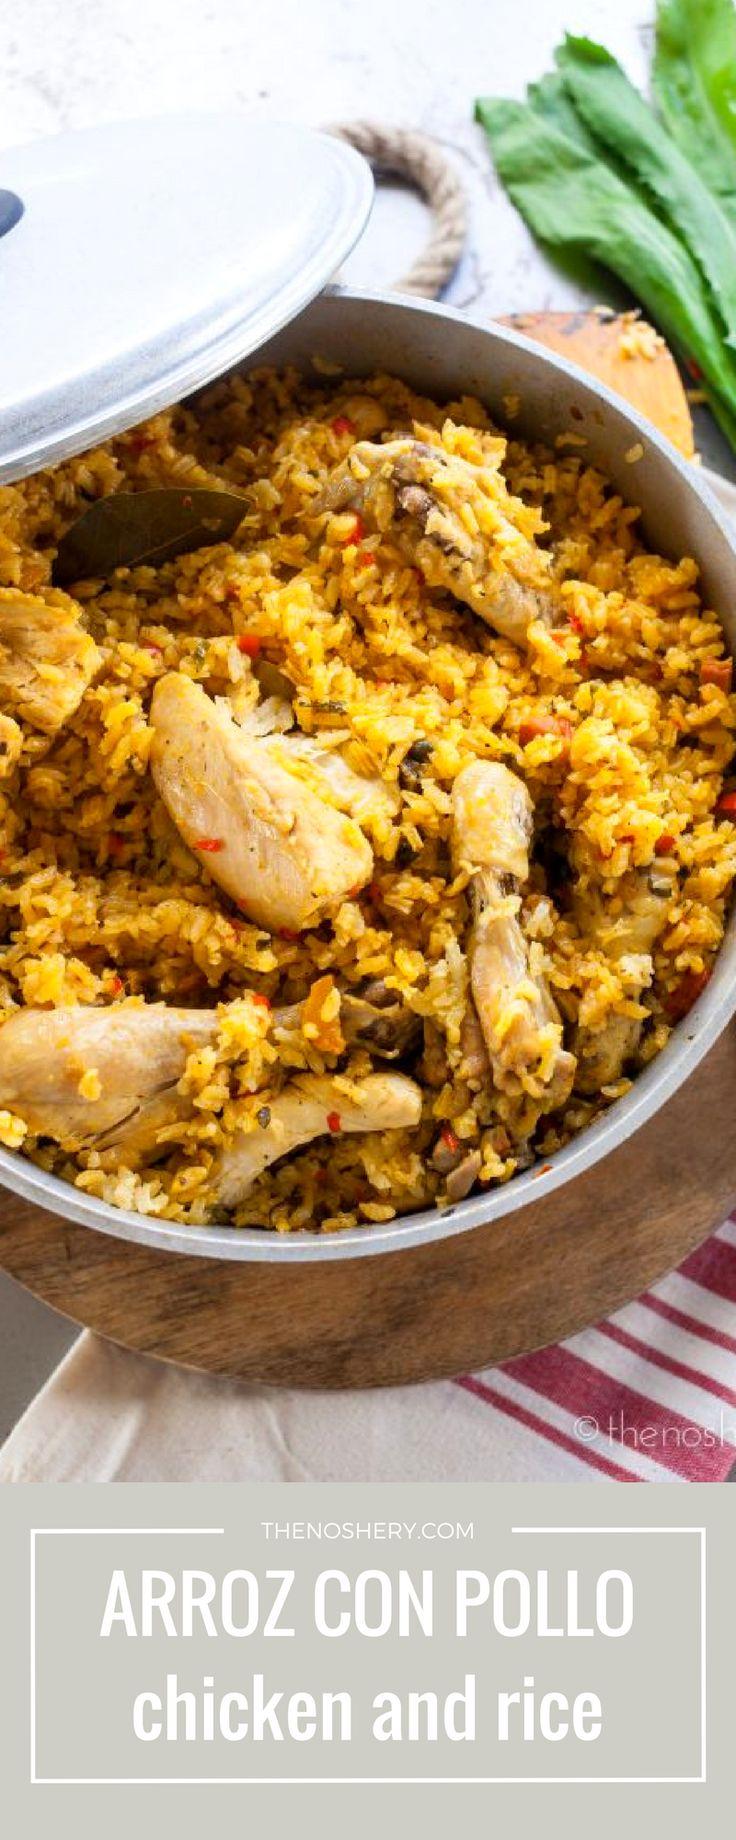 Arroz con Pollo (Chicken and Rice) | http://thenoshery.com/?utm_campaign=coschedule&utm_source=pinterest&utm_medium=The%20Noshery&utm_content=Arroz%20con%20Pollo%20%28Chicken%20and%20Rice%29